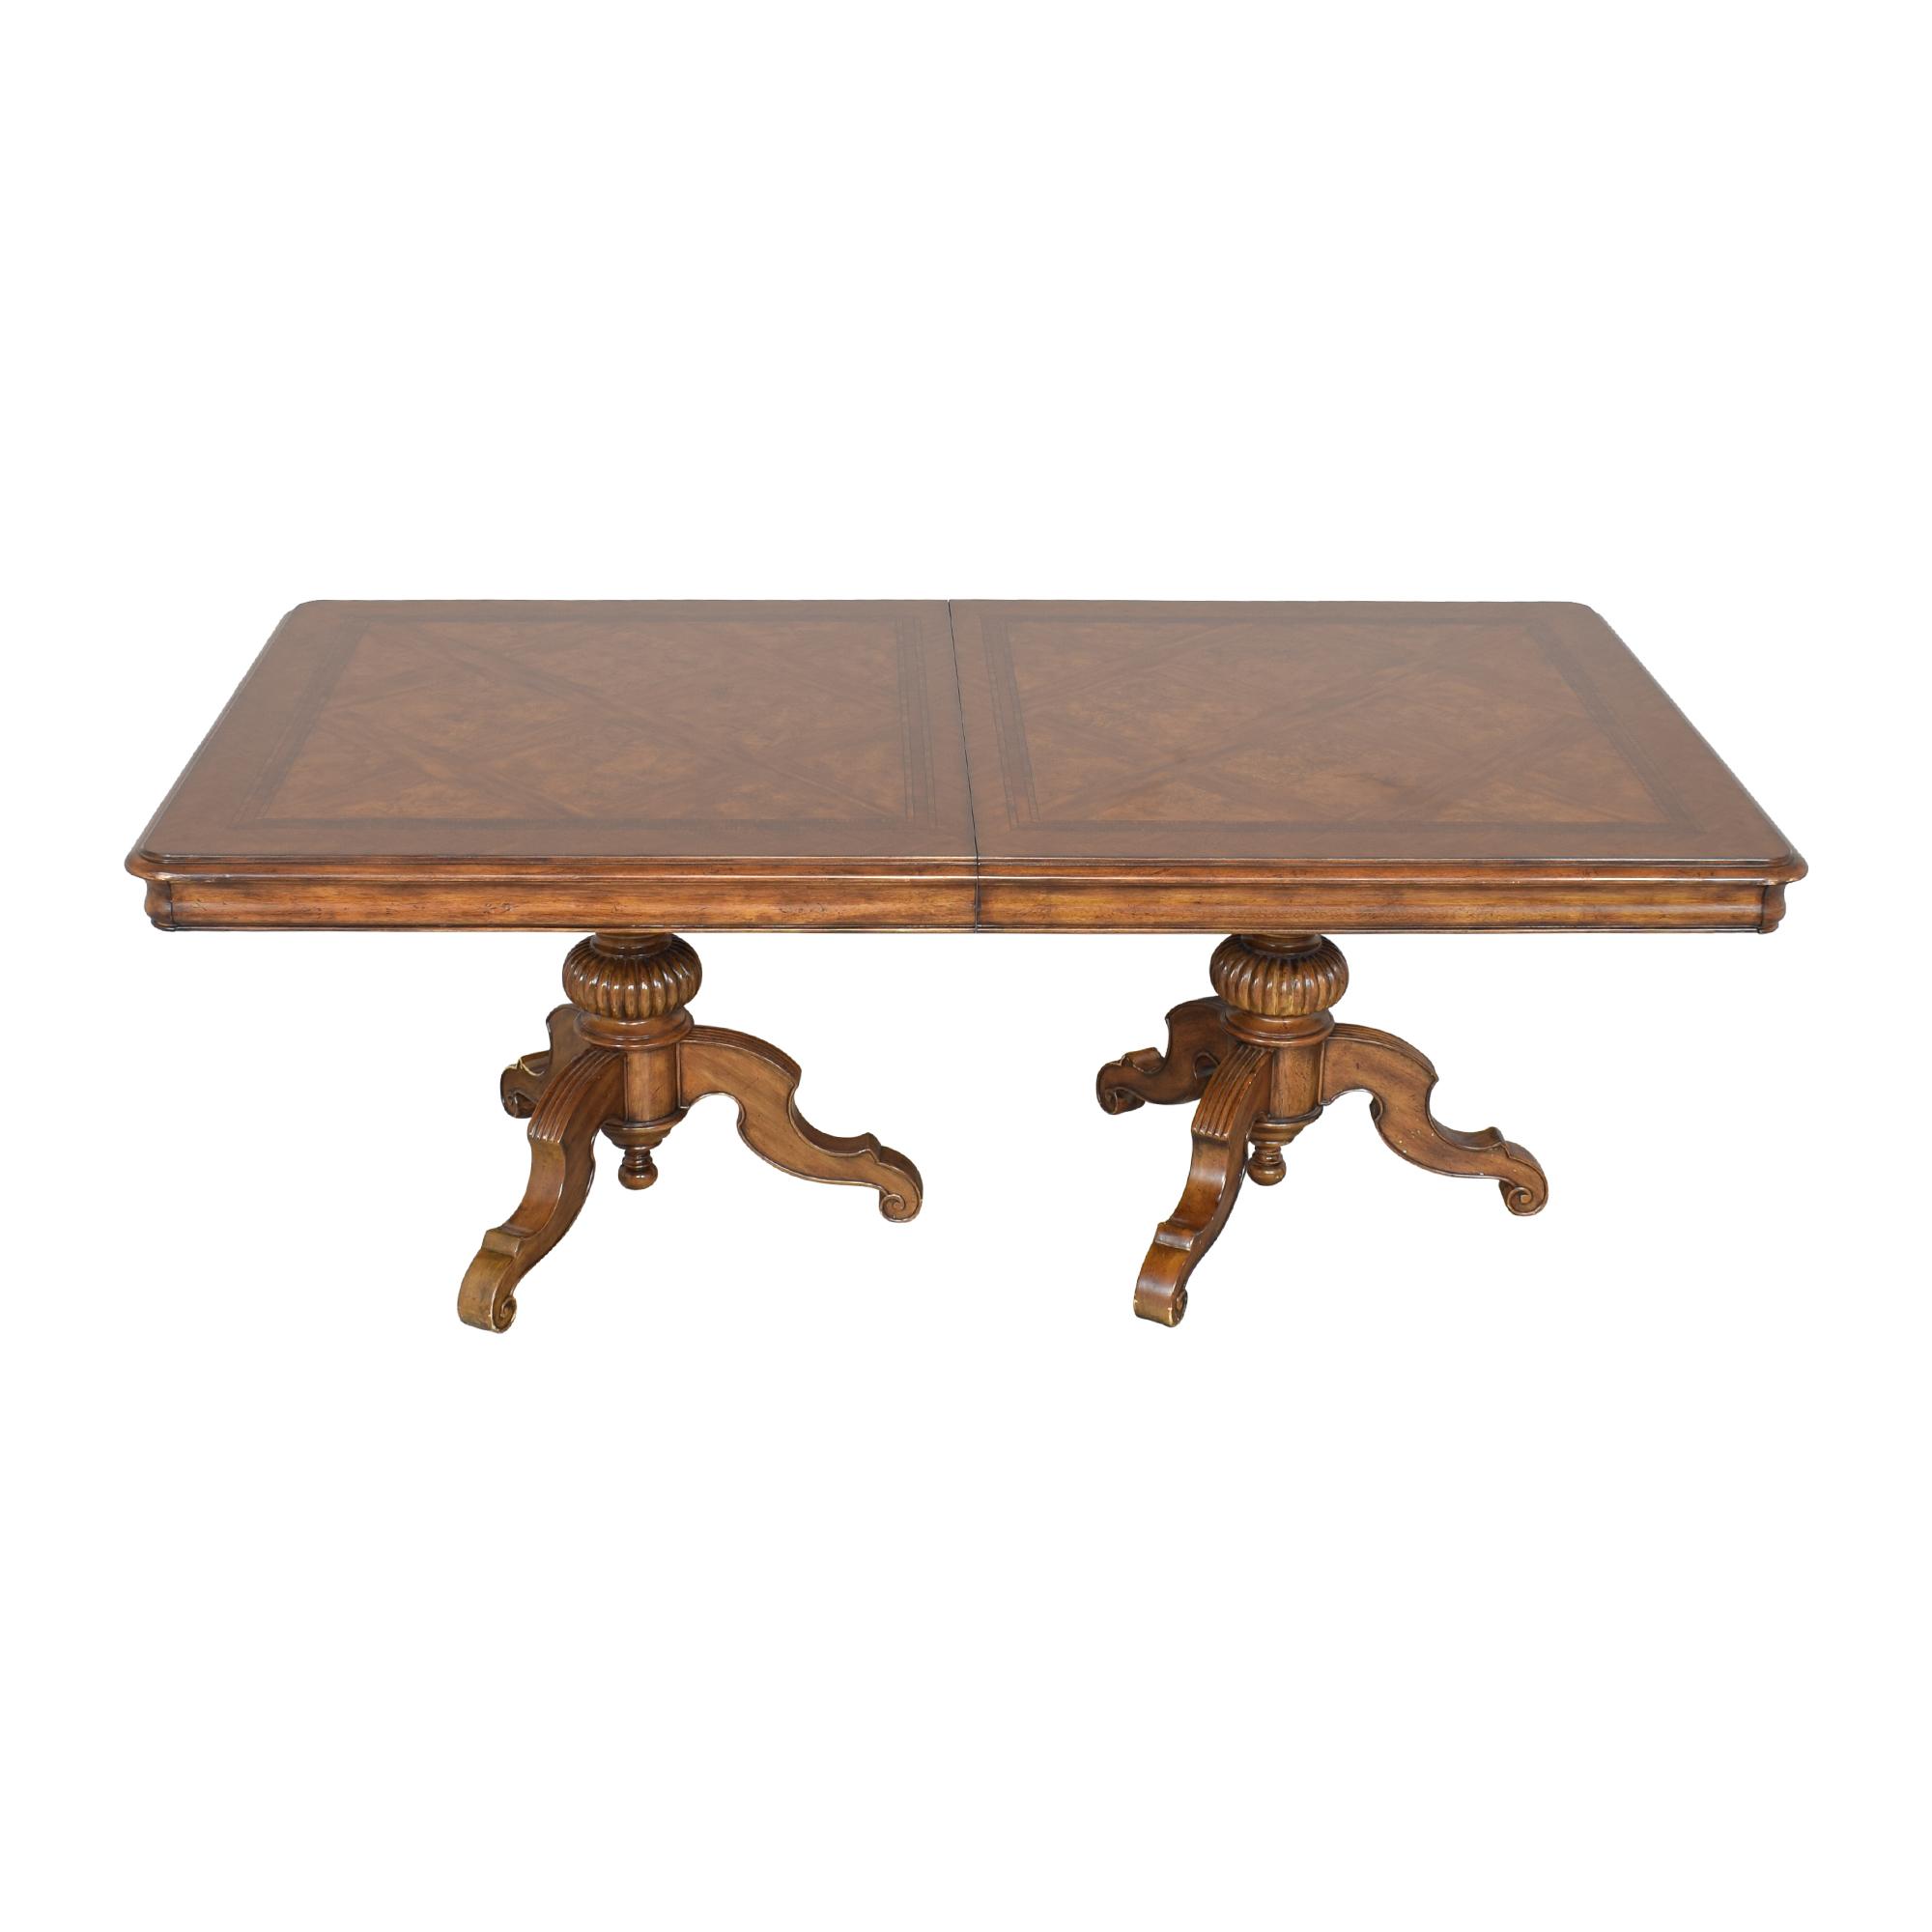 Thomasville Thomasville Ernest Hemingway Castillian Double Pedestal Dining Table nyc